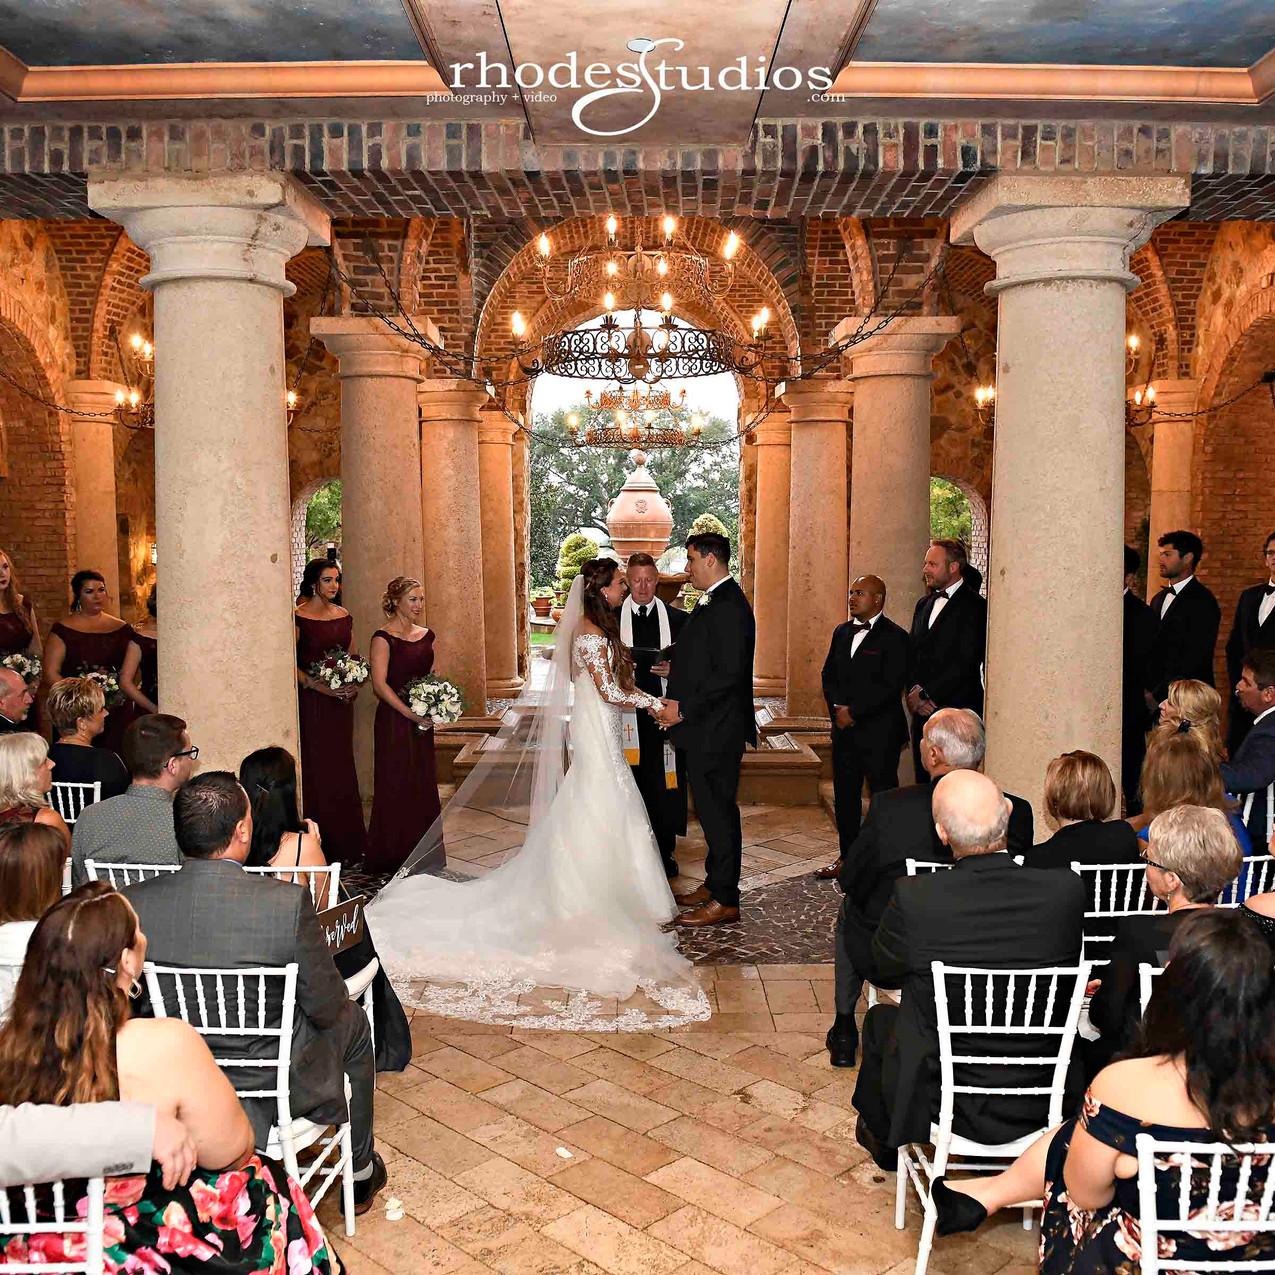 Lovely atrium wedding